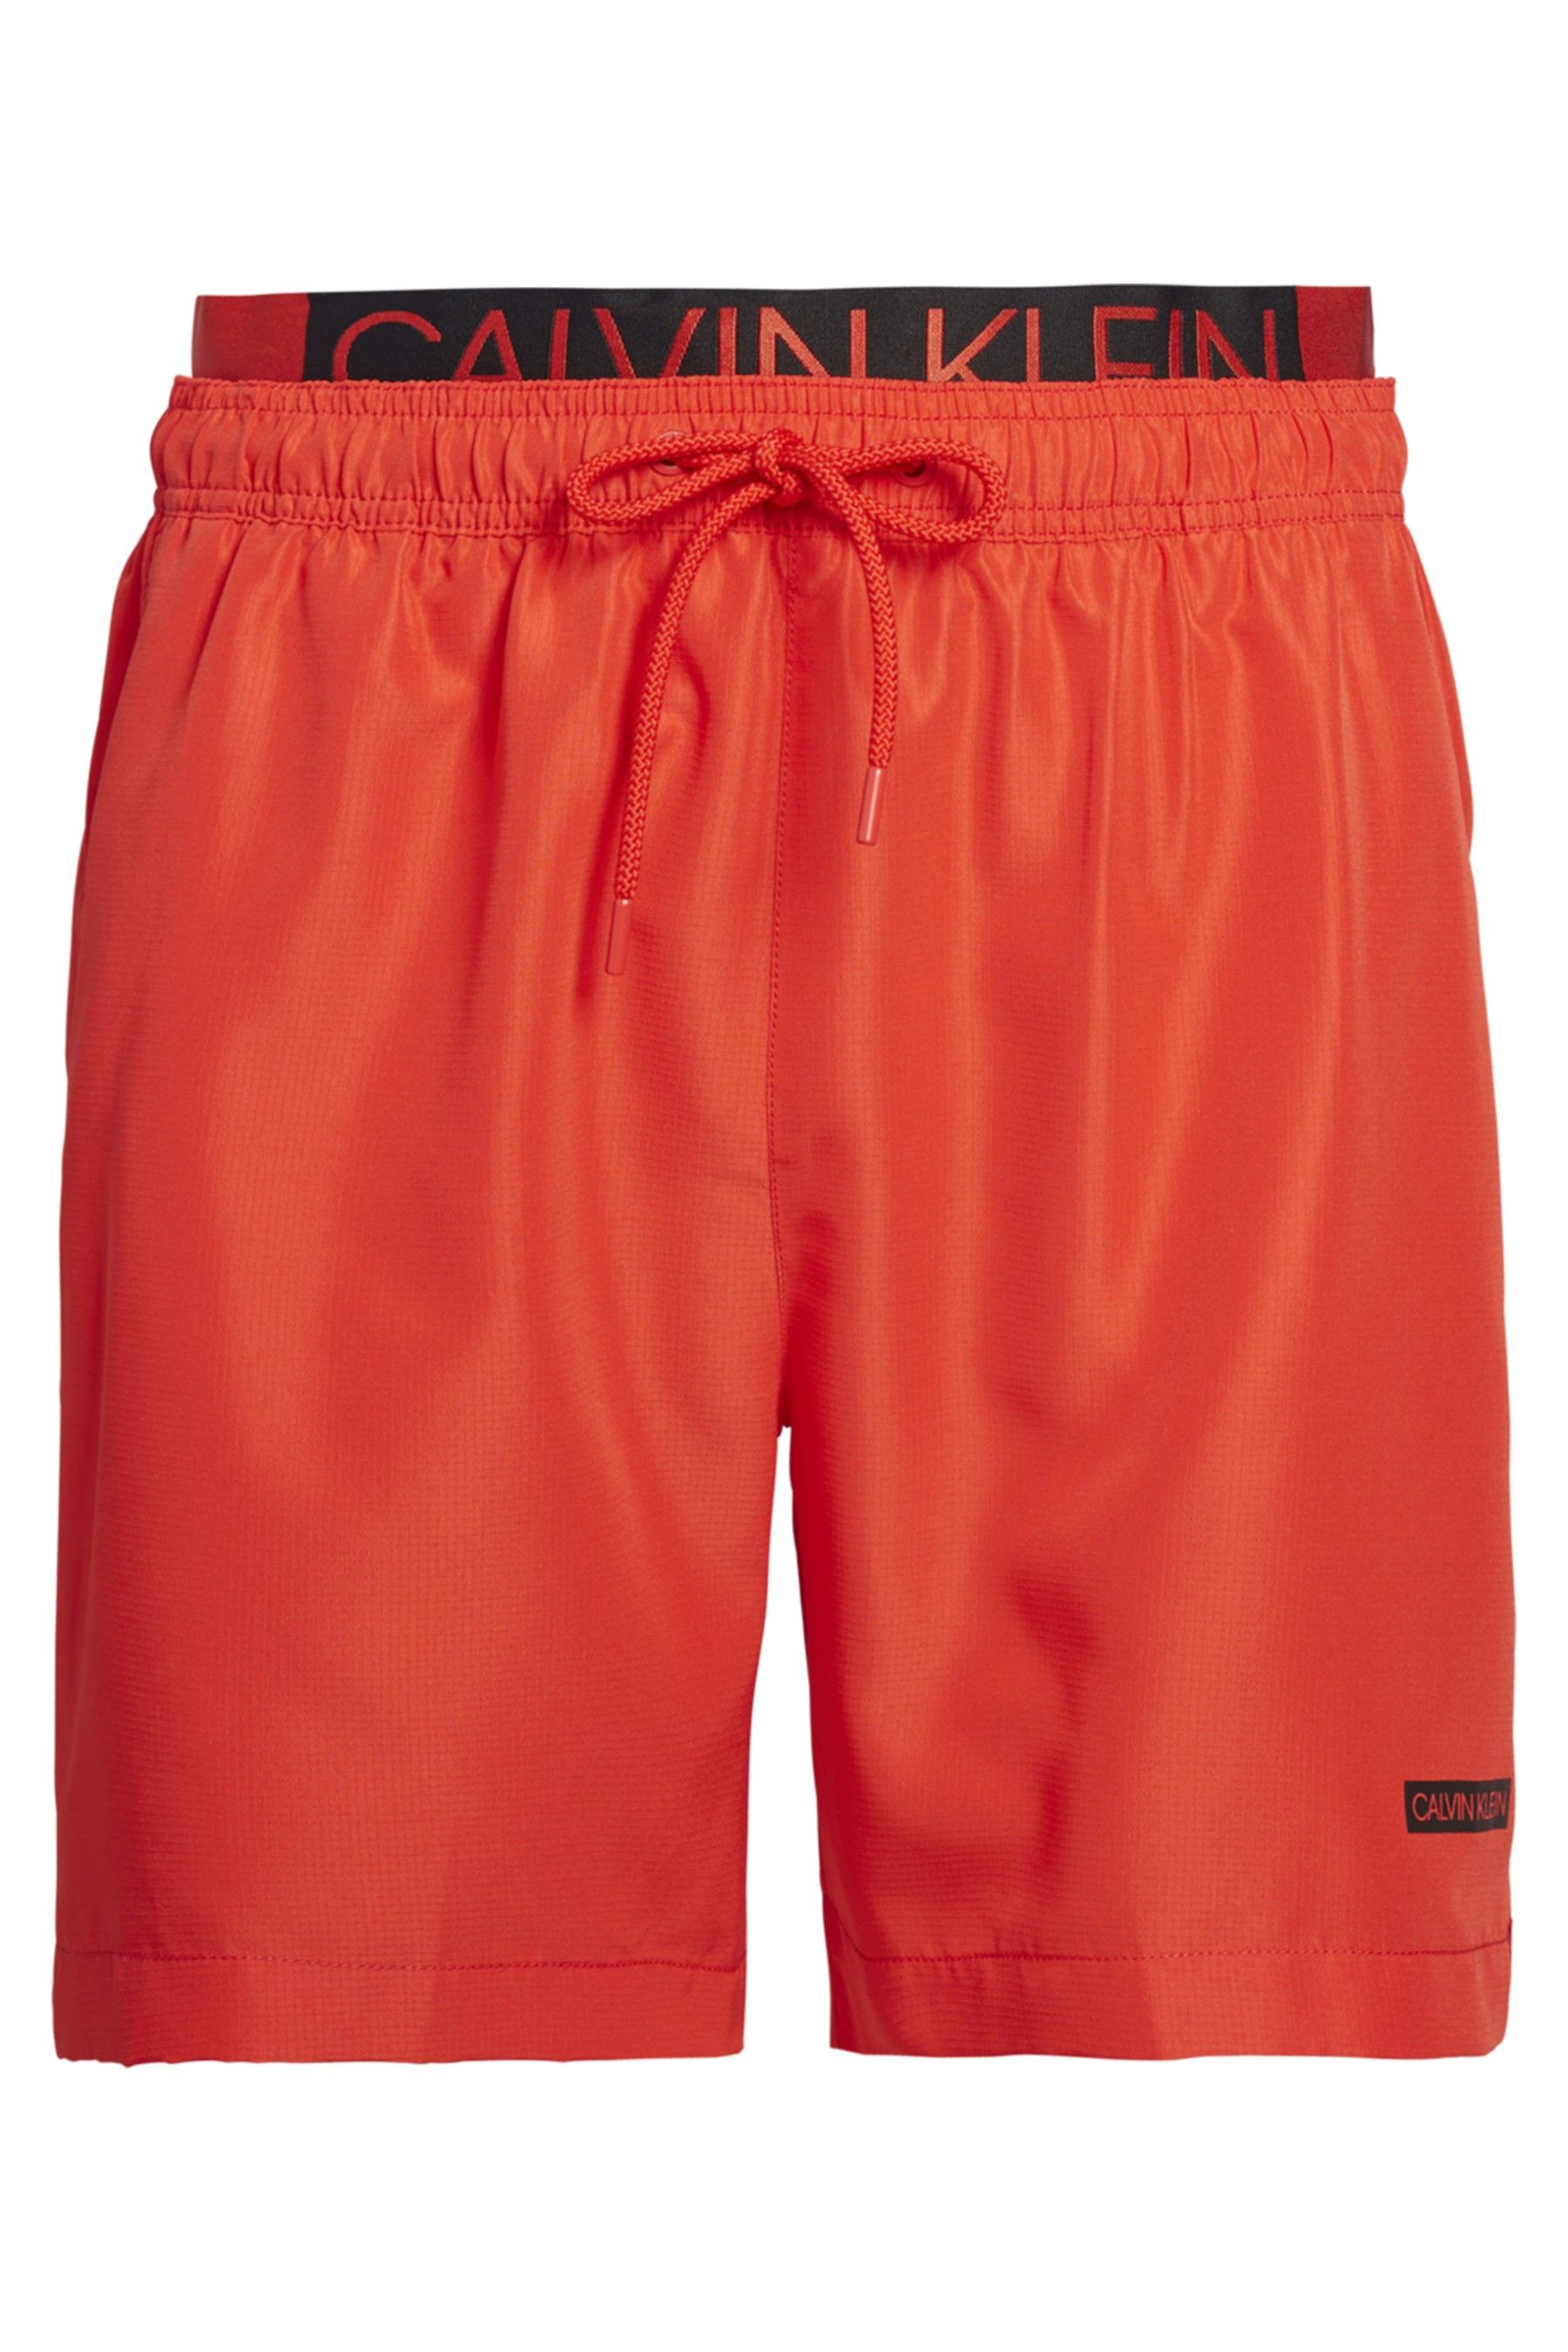 d95dad2e03 Mens Calvin Klein Double Waistband Swim Short - Red in 2019 ...